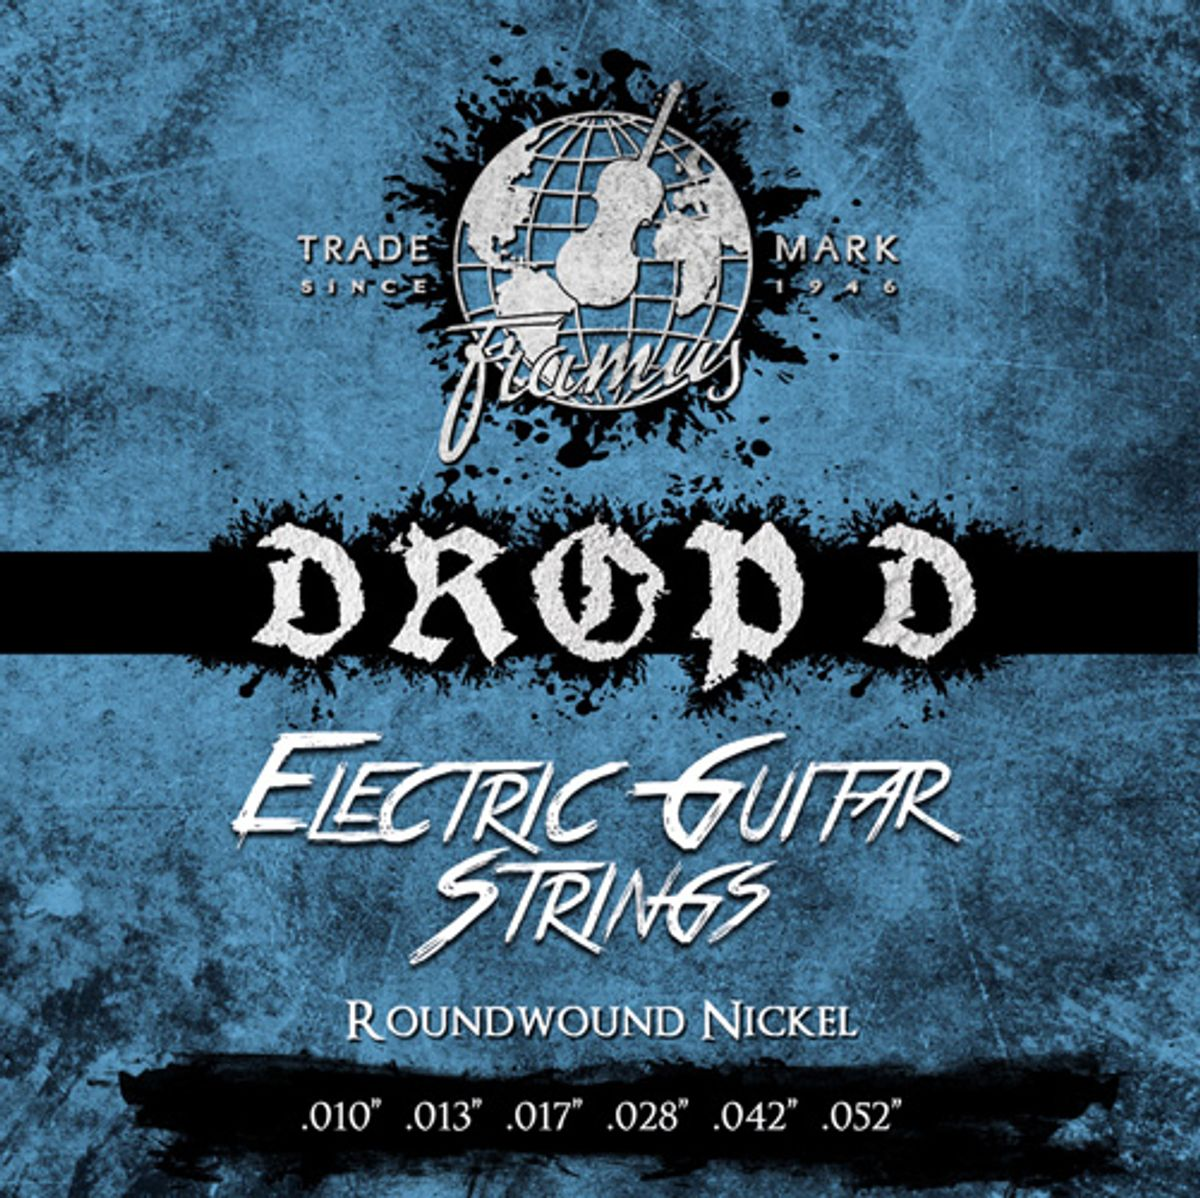 Framus Introduces Blue Label Electric Guitar Strings